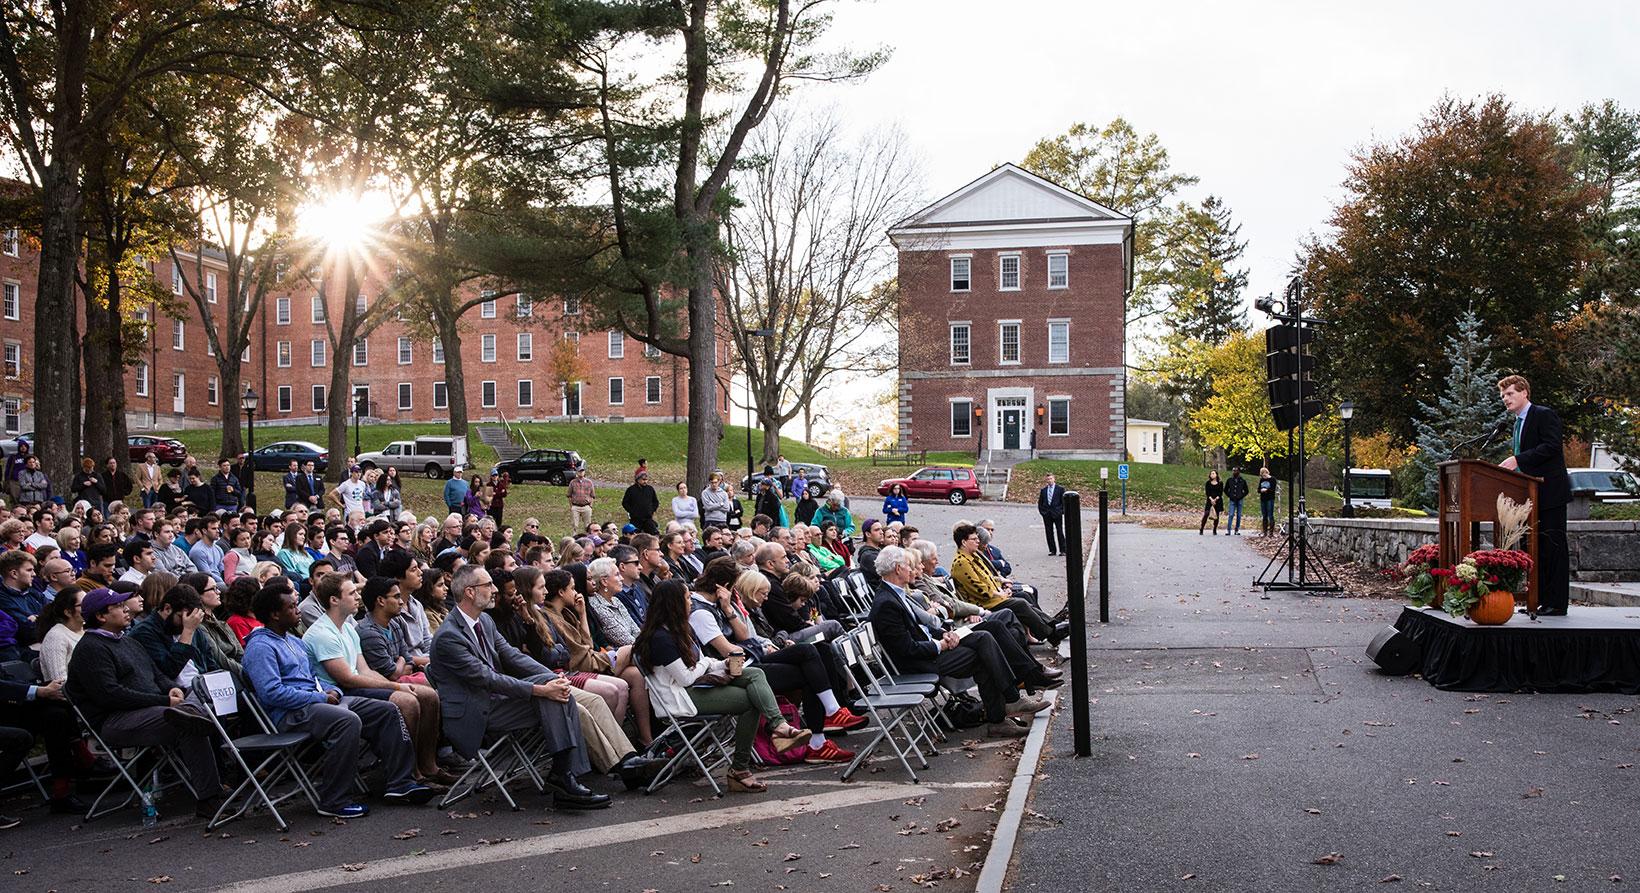 Joseph Kennedy delivering key note address on Oct. 29, 2017